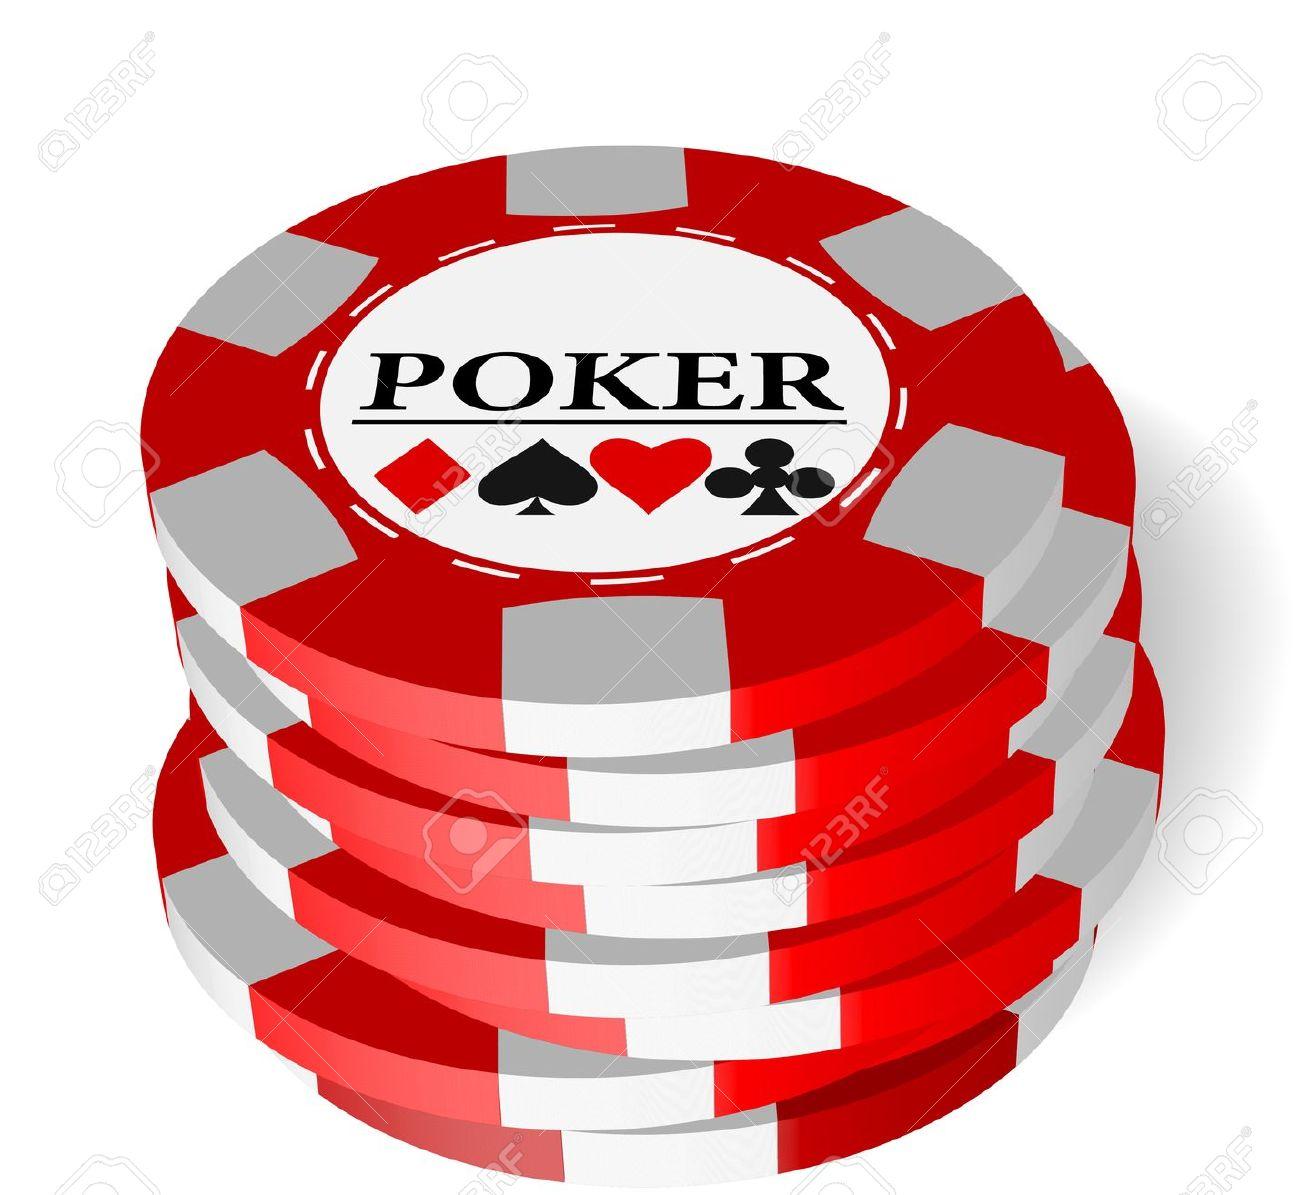 Poker Chips Clipart Free ClipartFest Cli-Poker chips clipart free ClipartFest ClipartFest of gambling chips-14